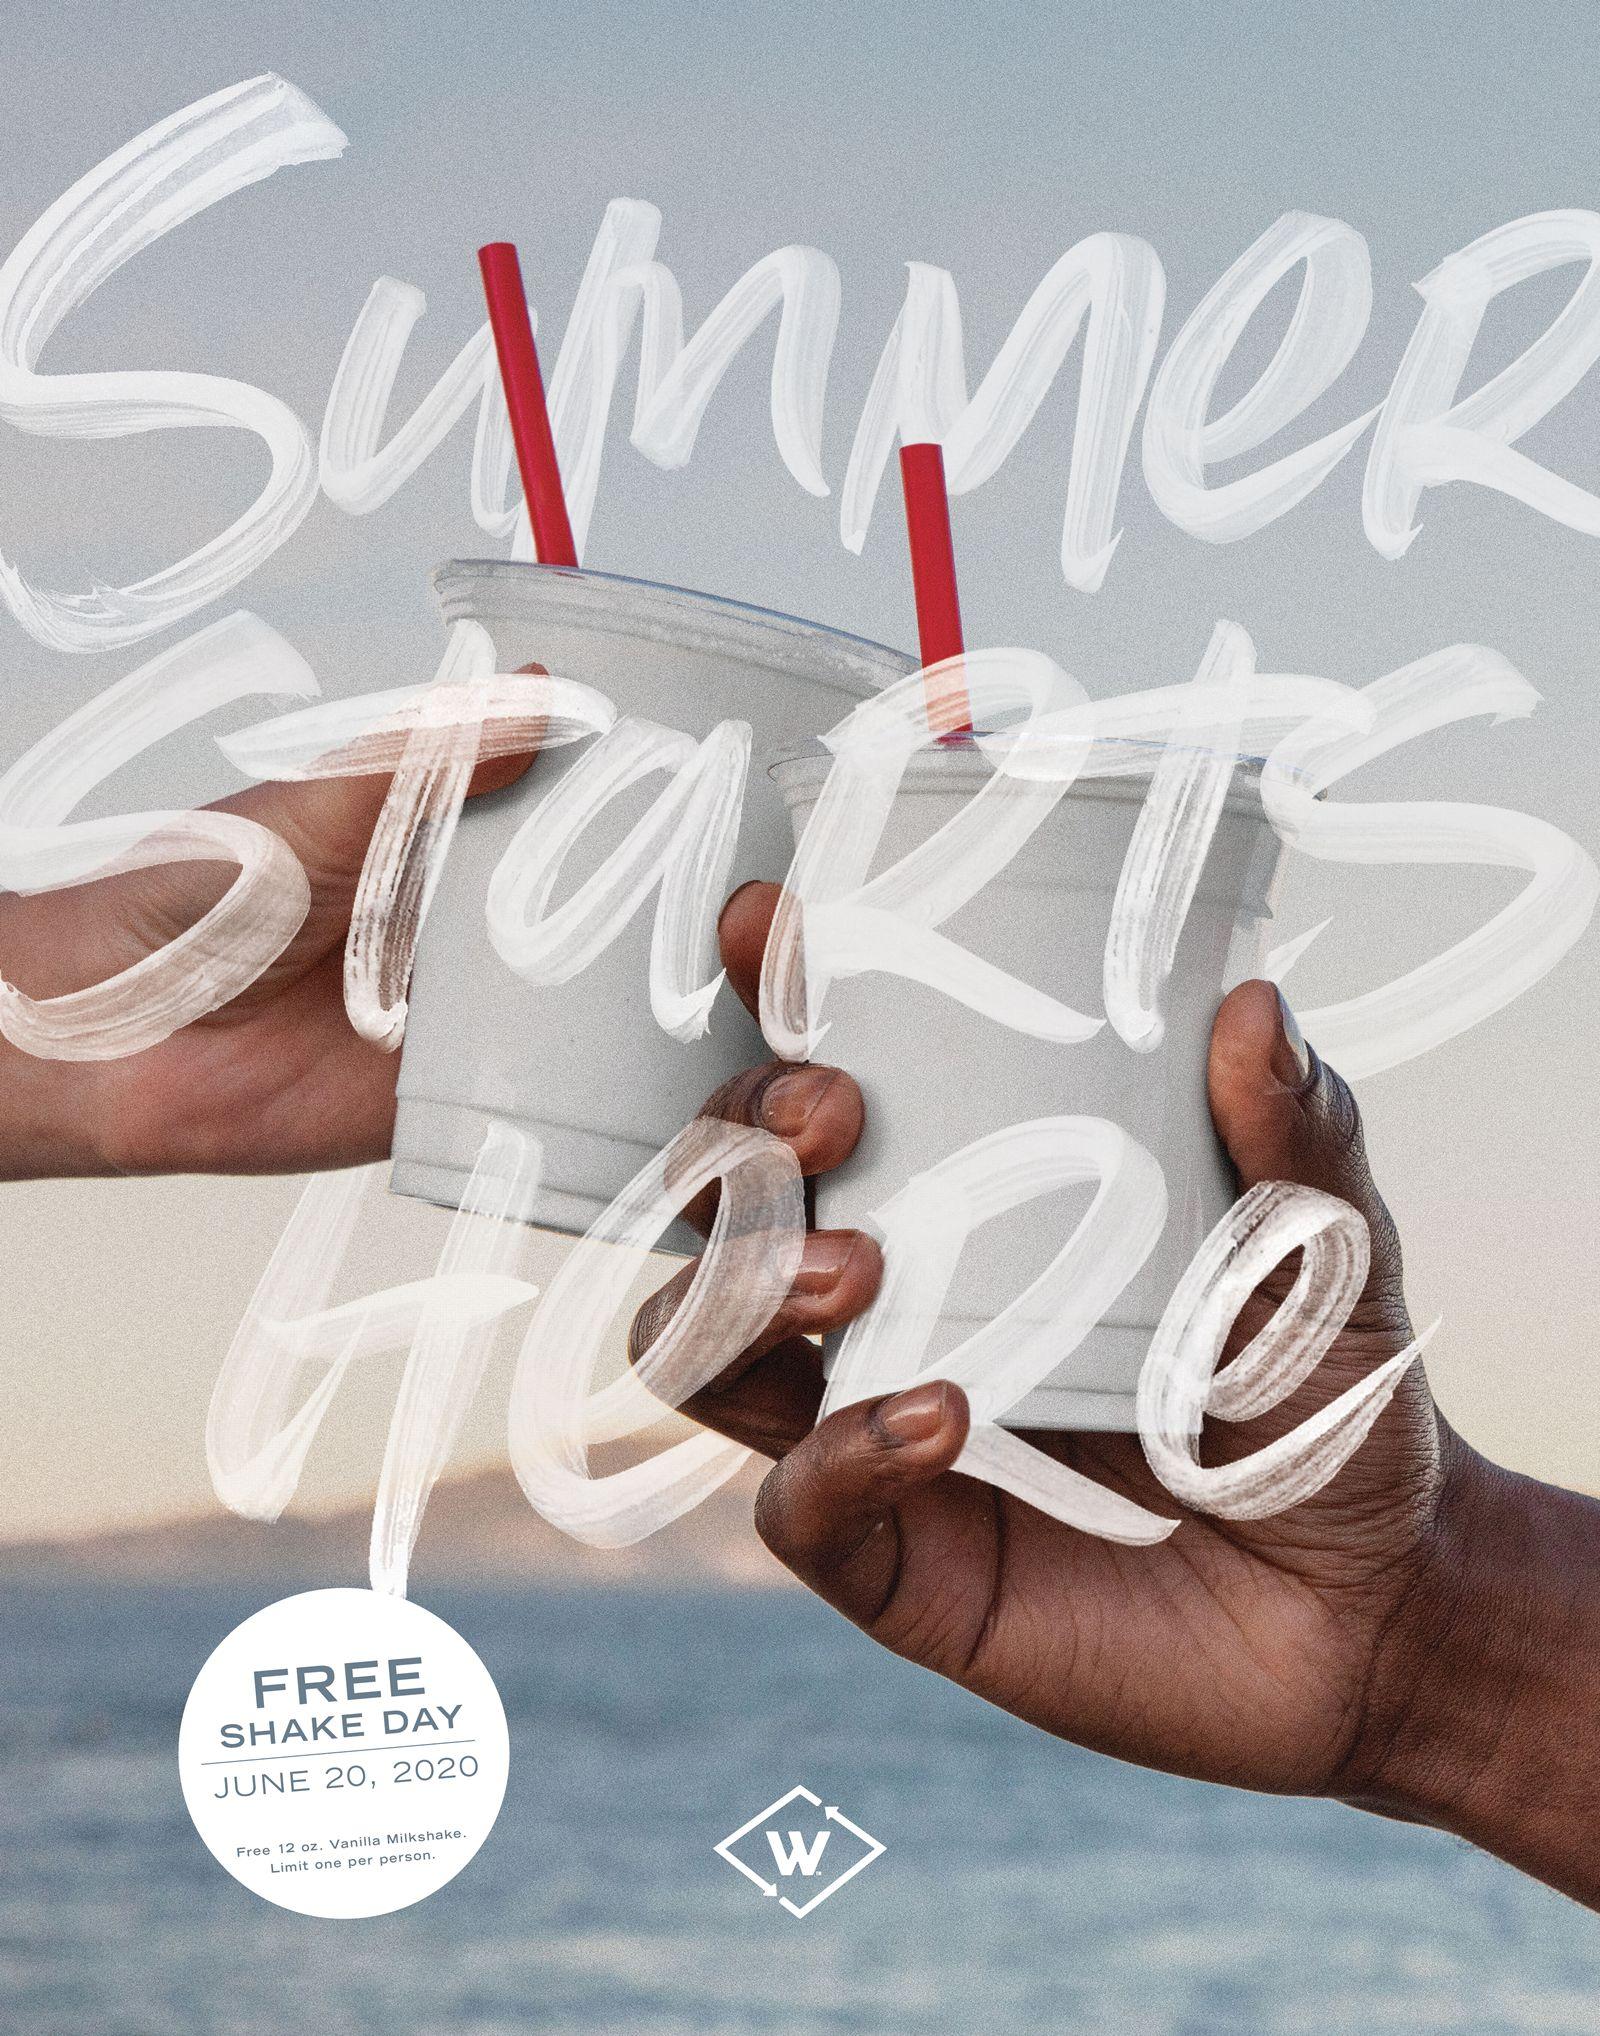 Wayback Burgers Kicks Off Summer with a Free Milkshake